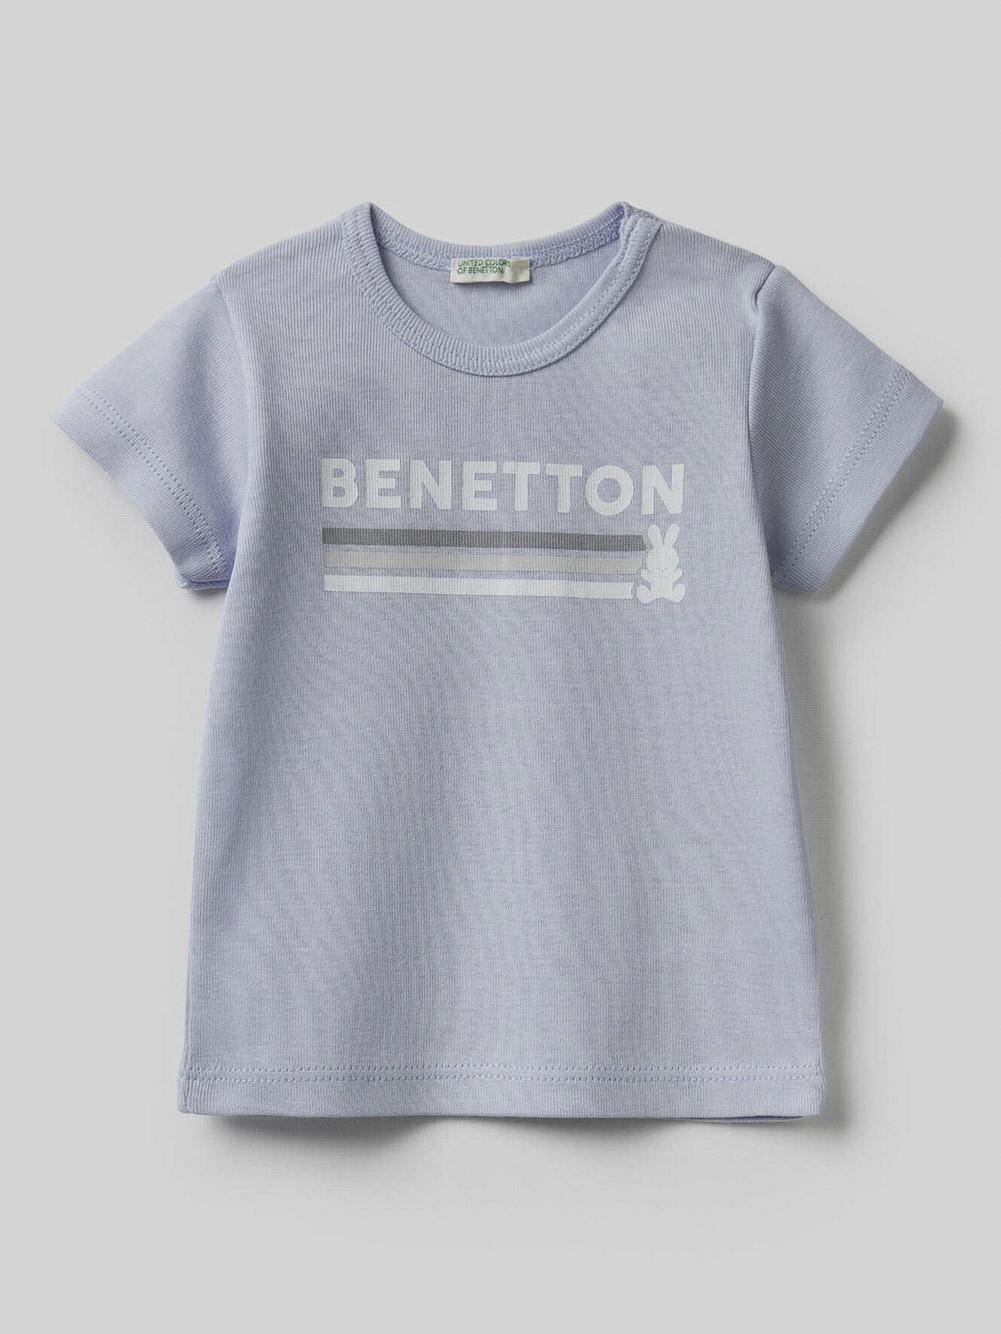 012 BENETTON T-SHIRT W 3I9WMM28H 21P081